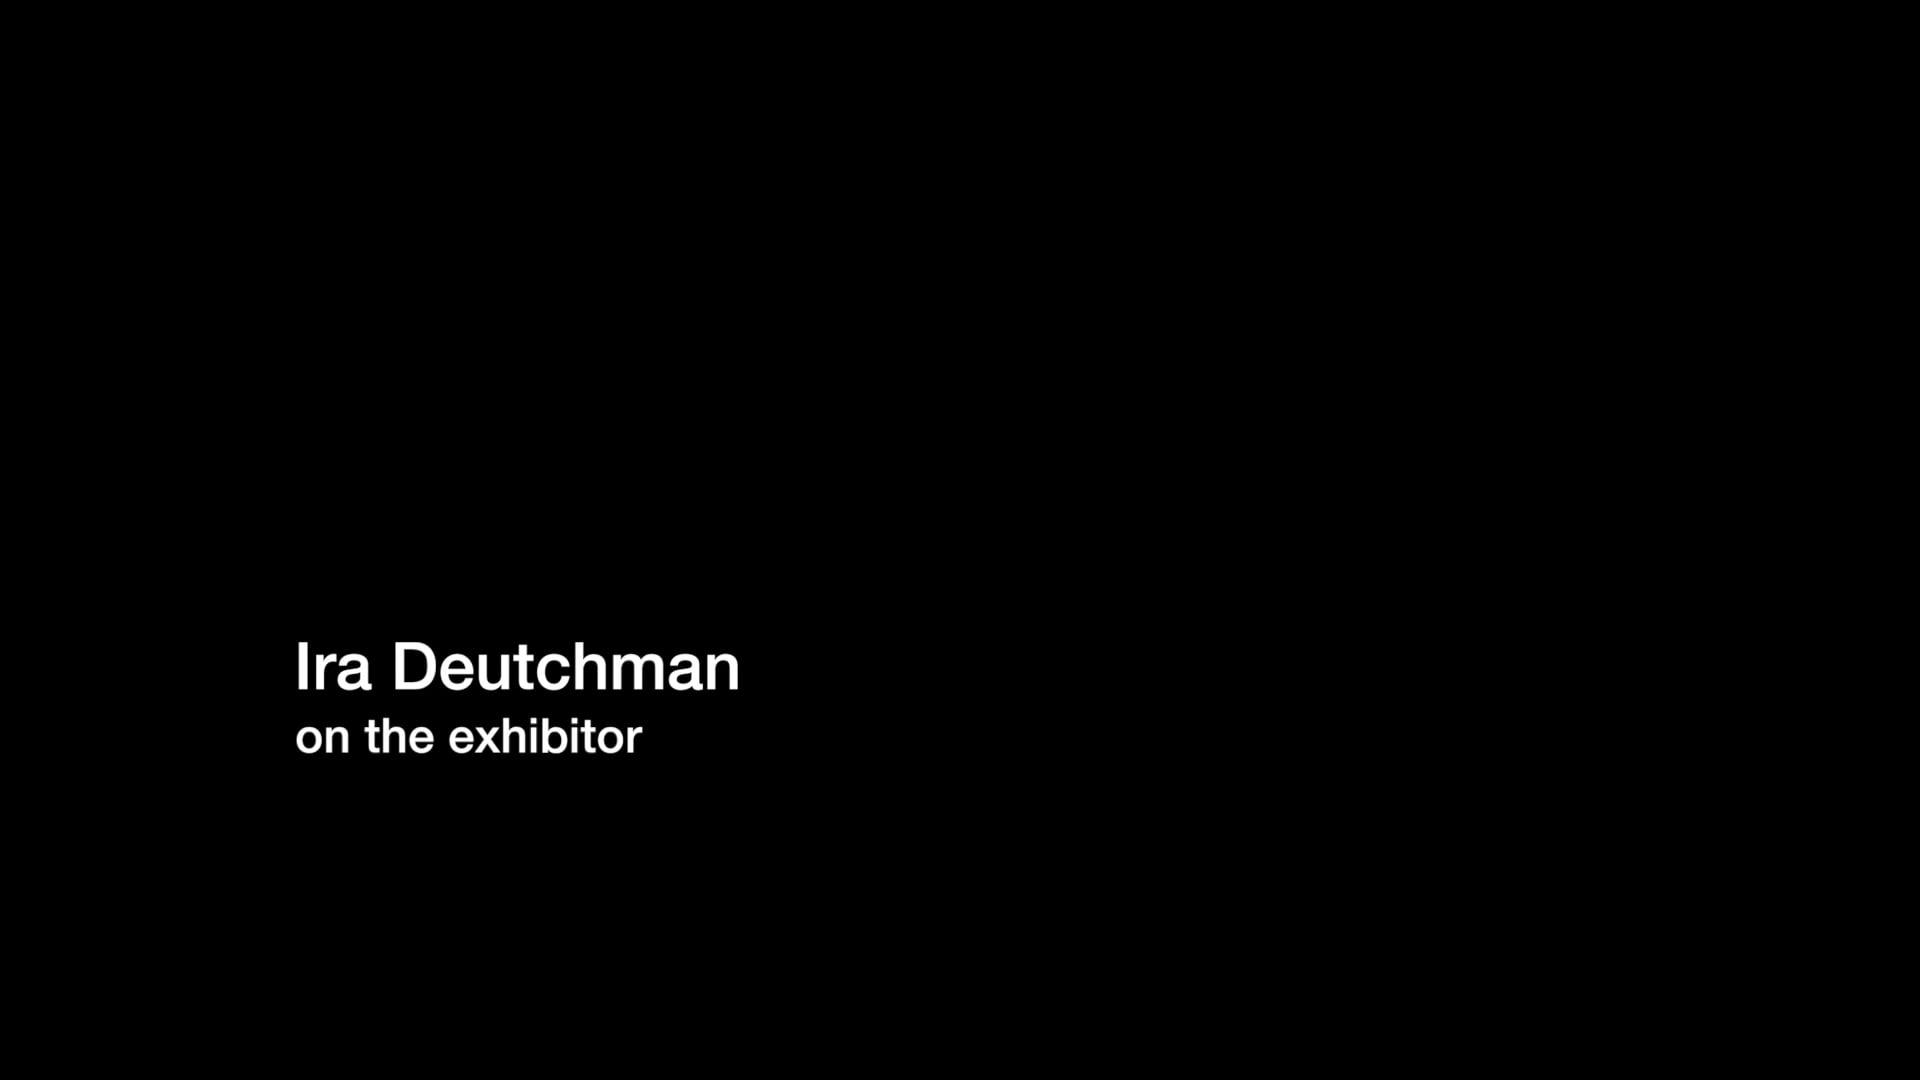 Ira Deutchman on the exhibitor